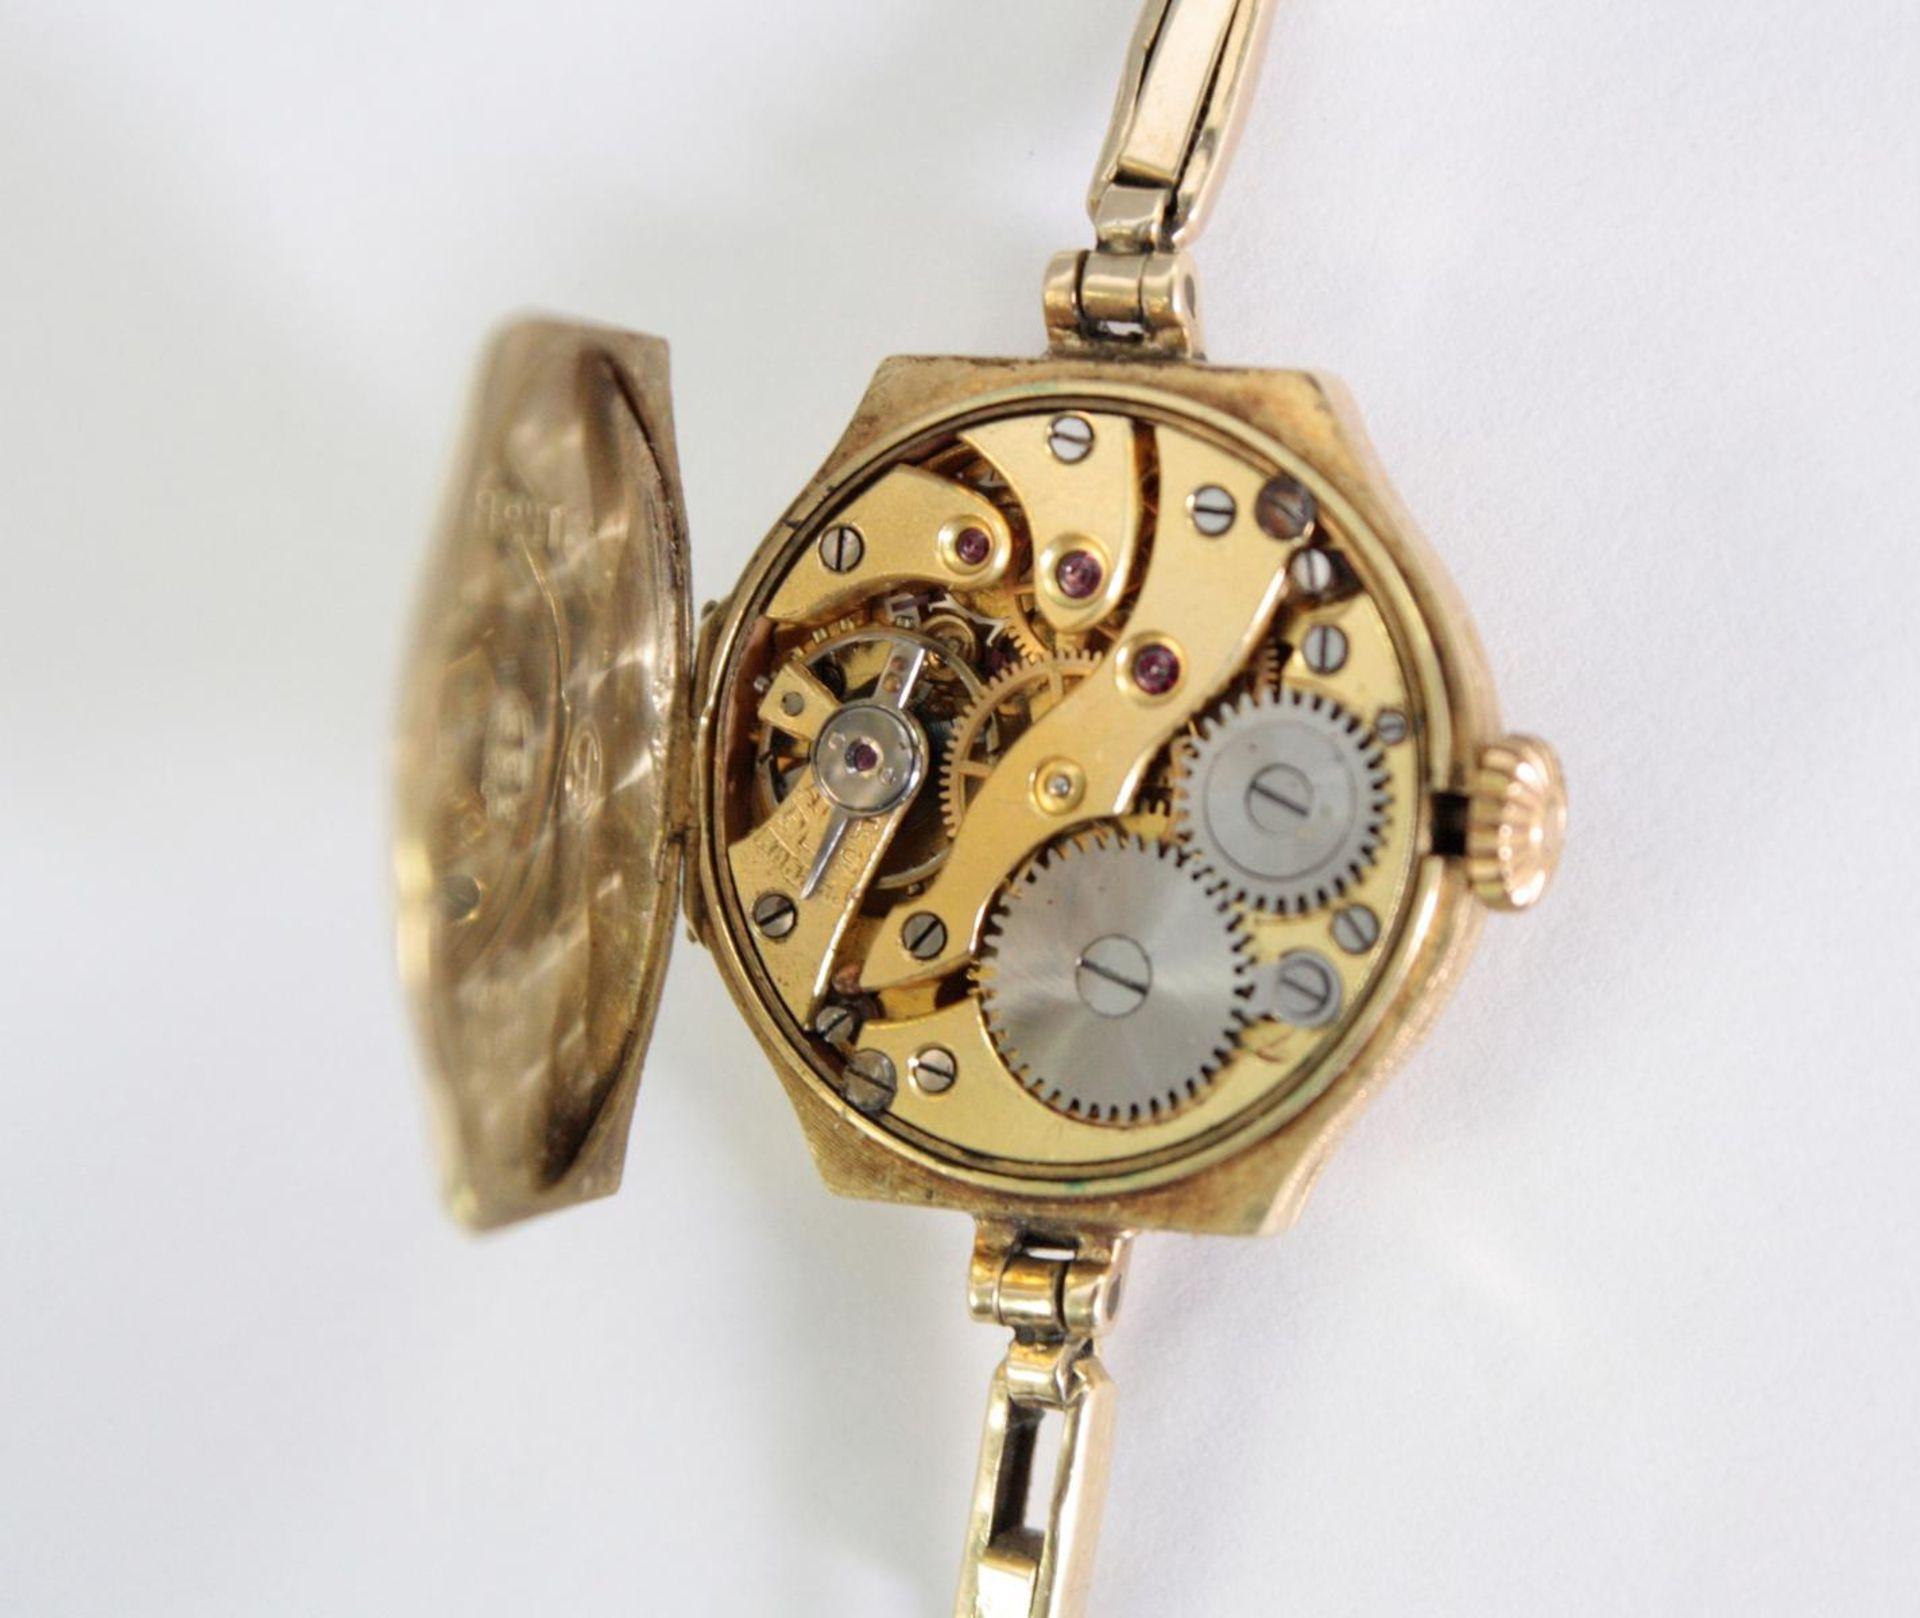 Antike Damenarmbanduhr, 14 Karat Gelbgold - Bild 4 aus 5